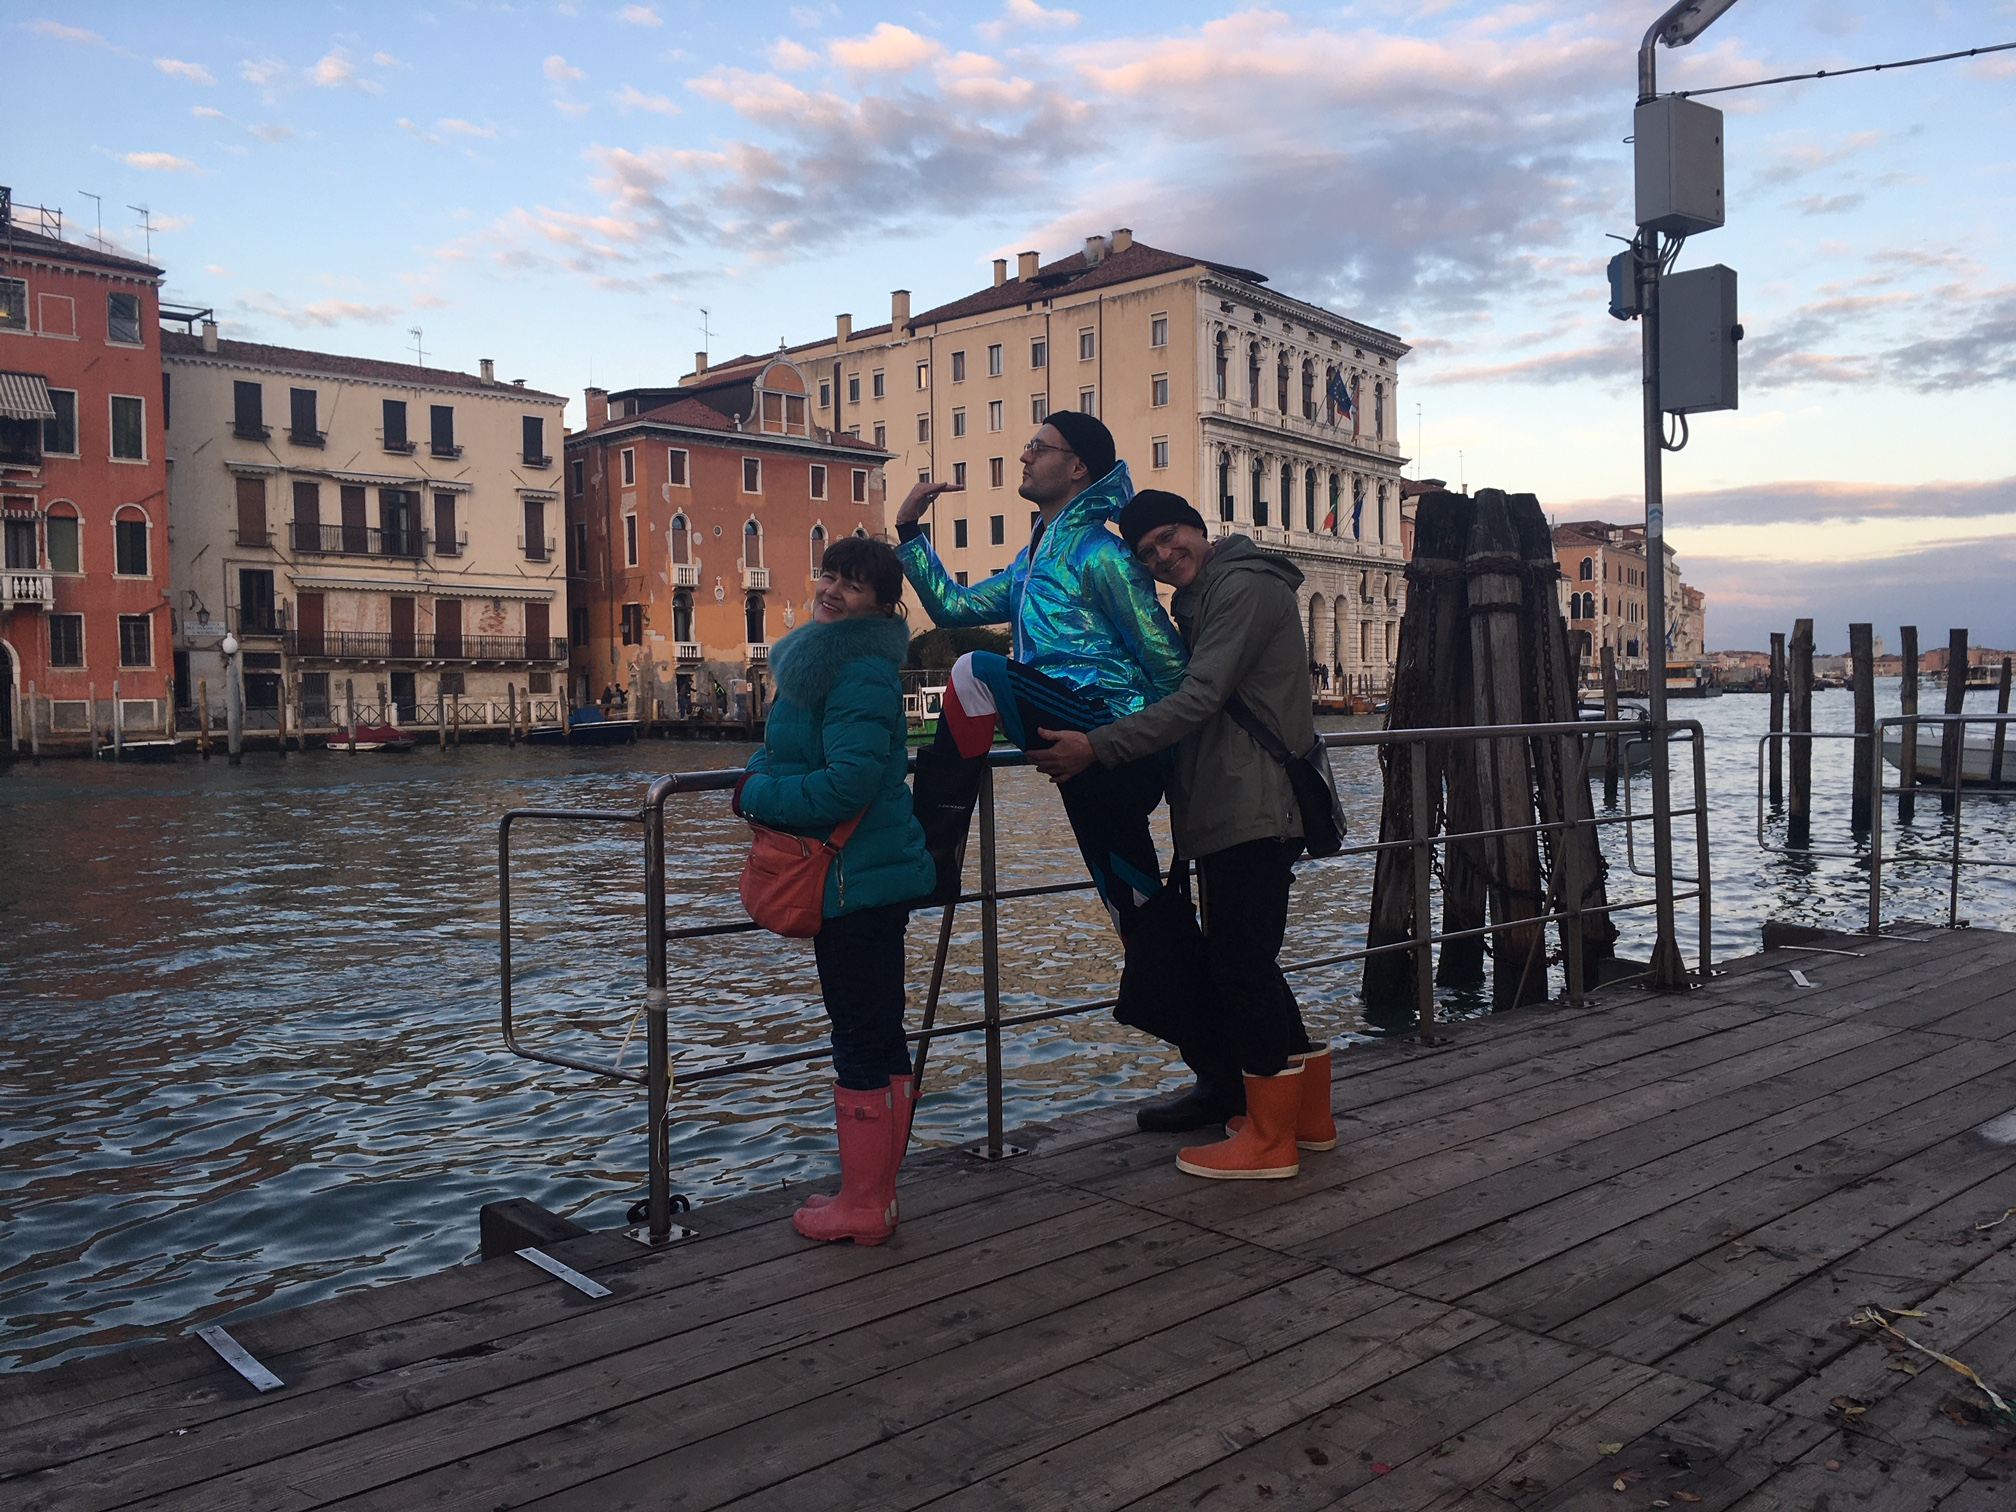 Mein Geburtstag in Venedig.